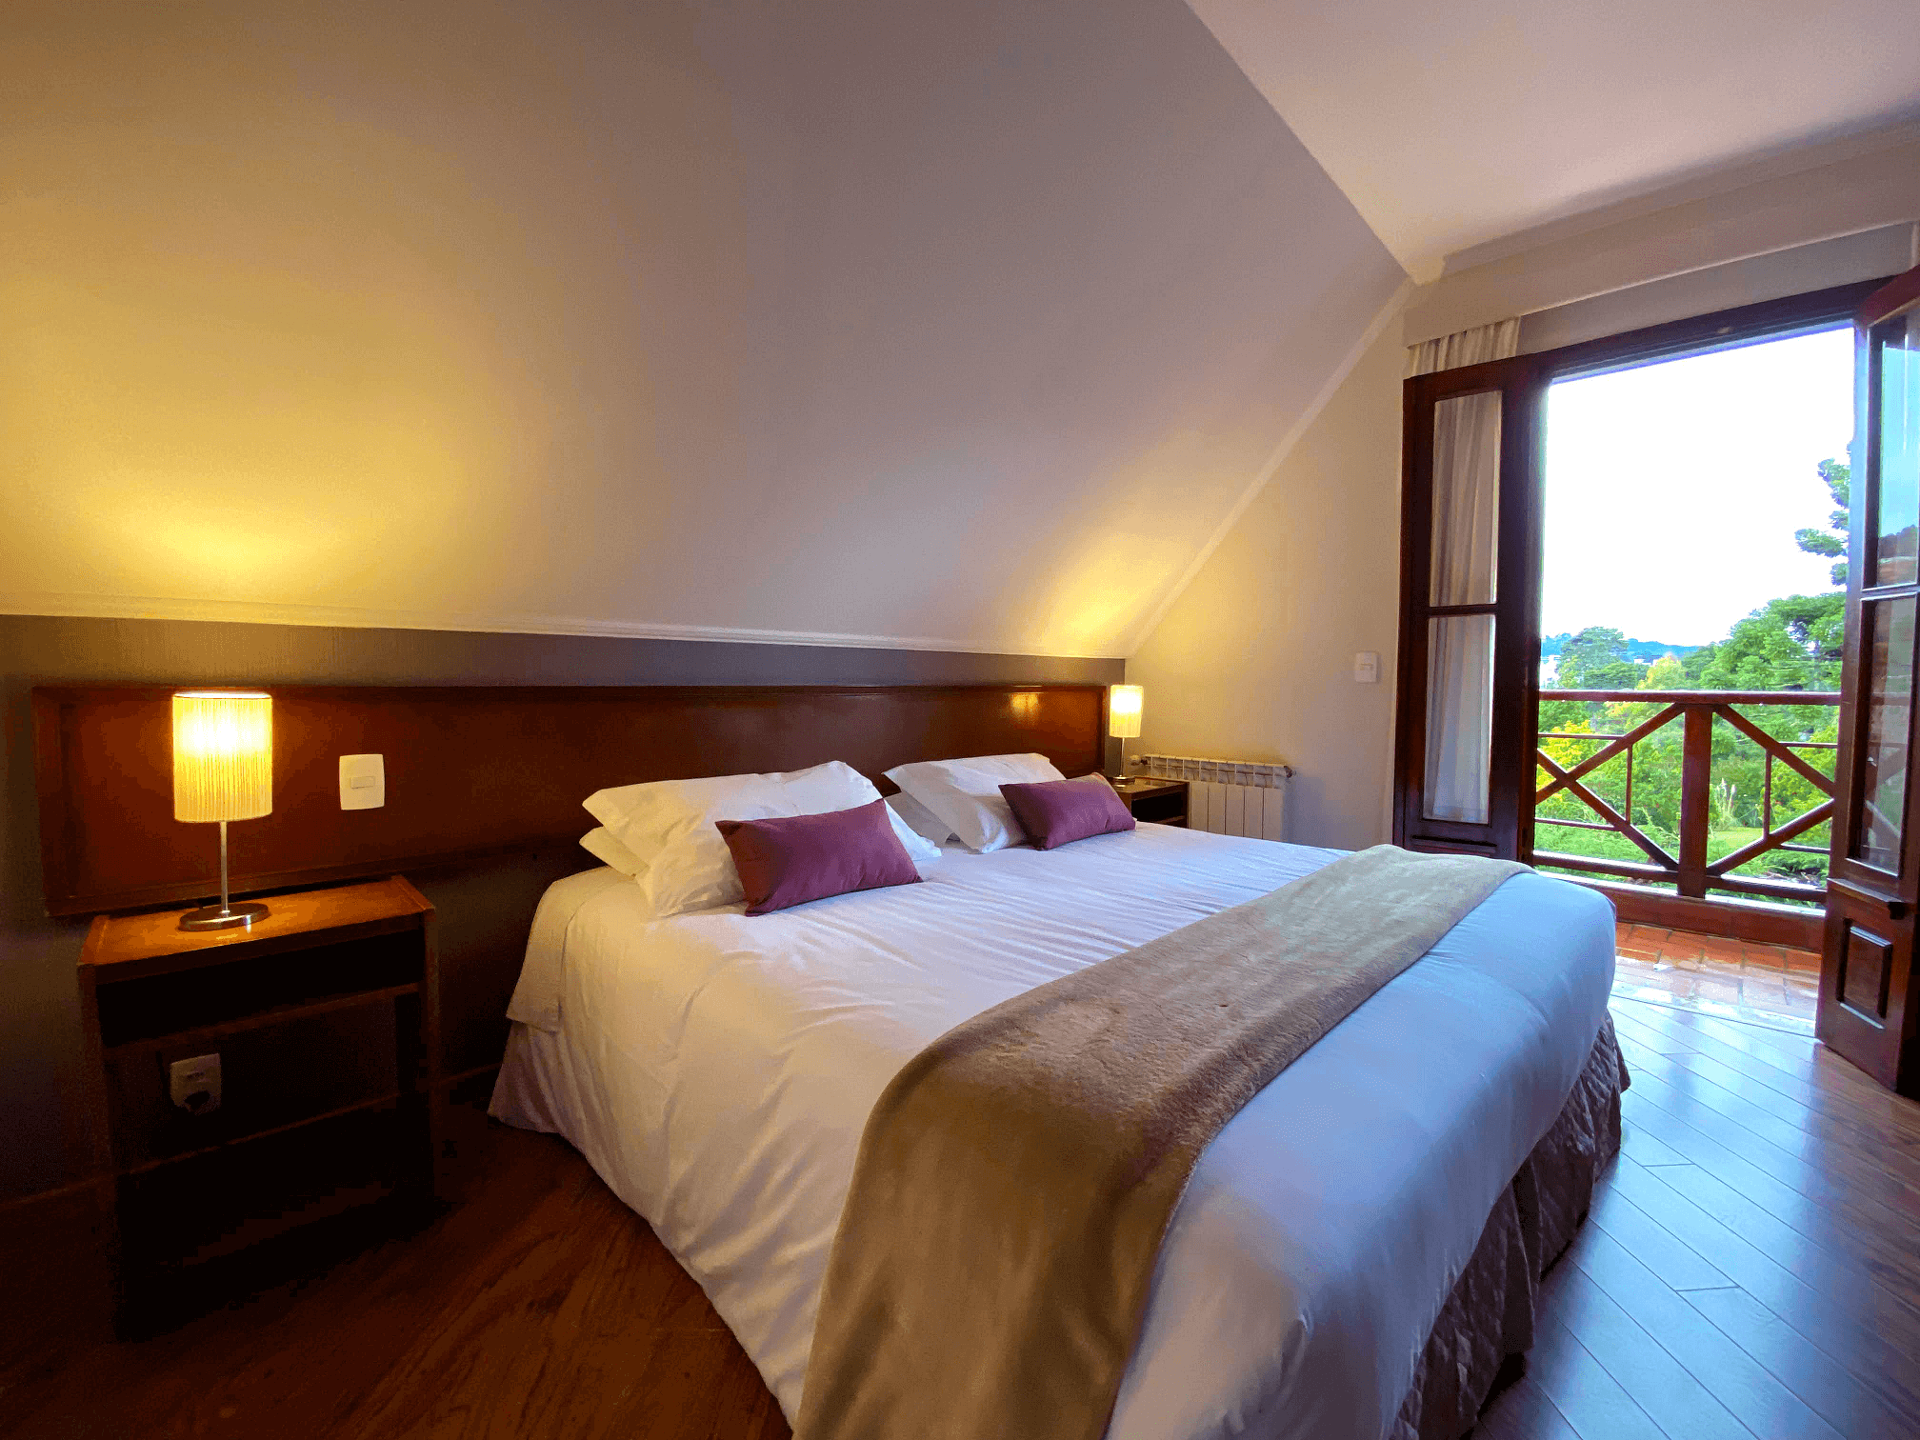 Deluxe Double Room - With Balcony